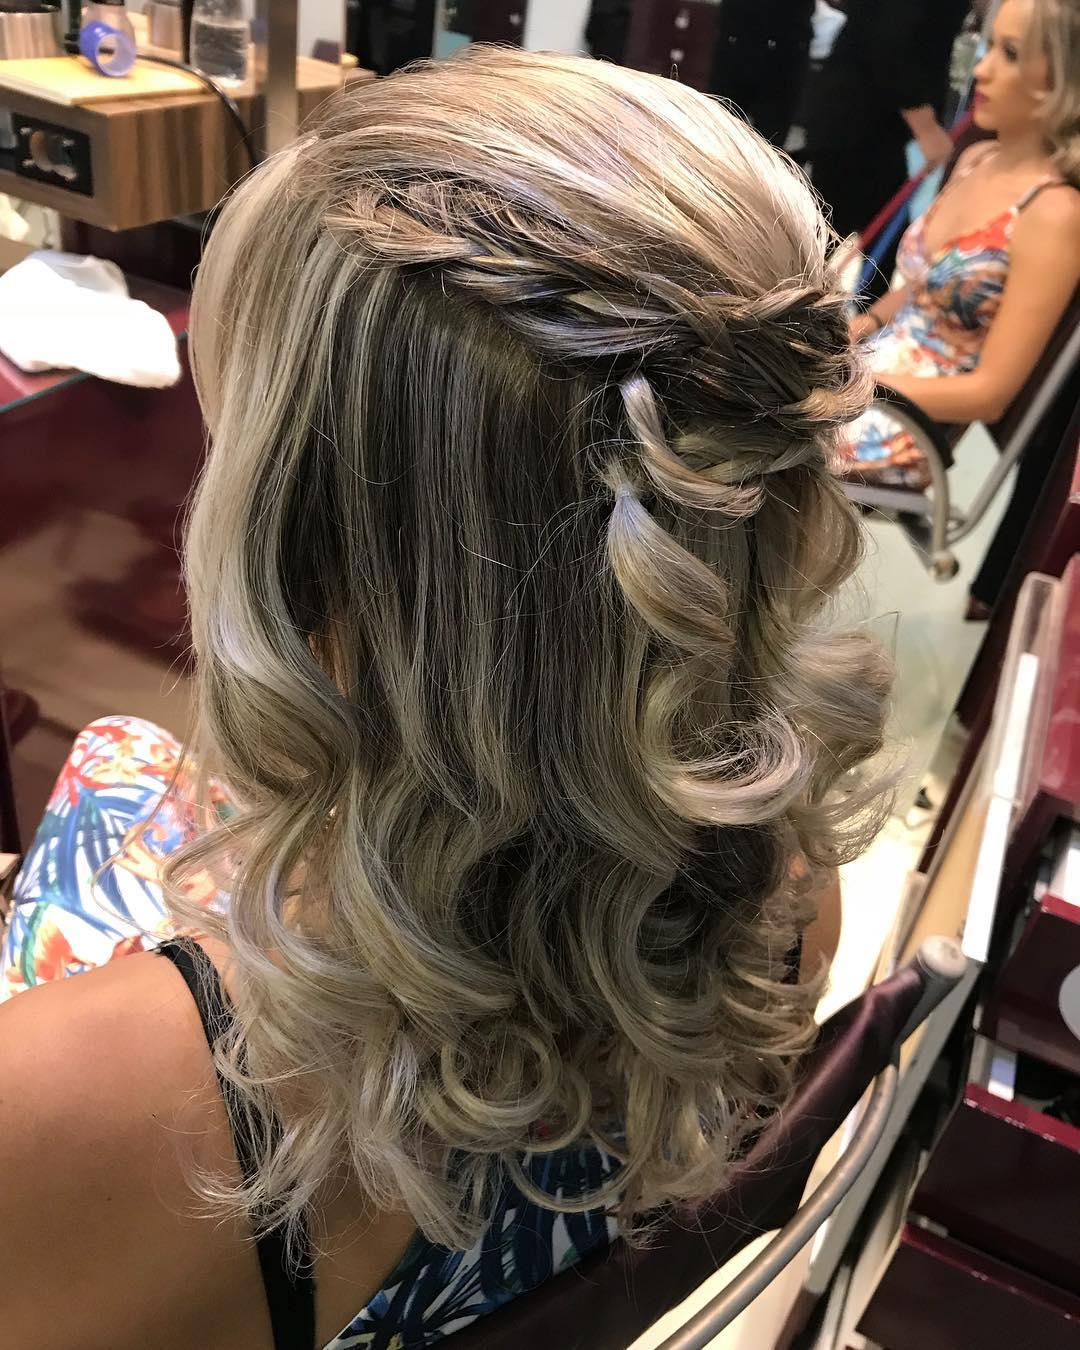 penteado para festa cabelo solto